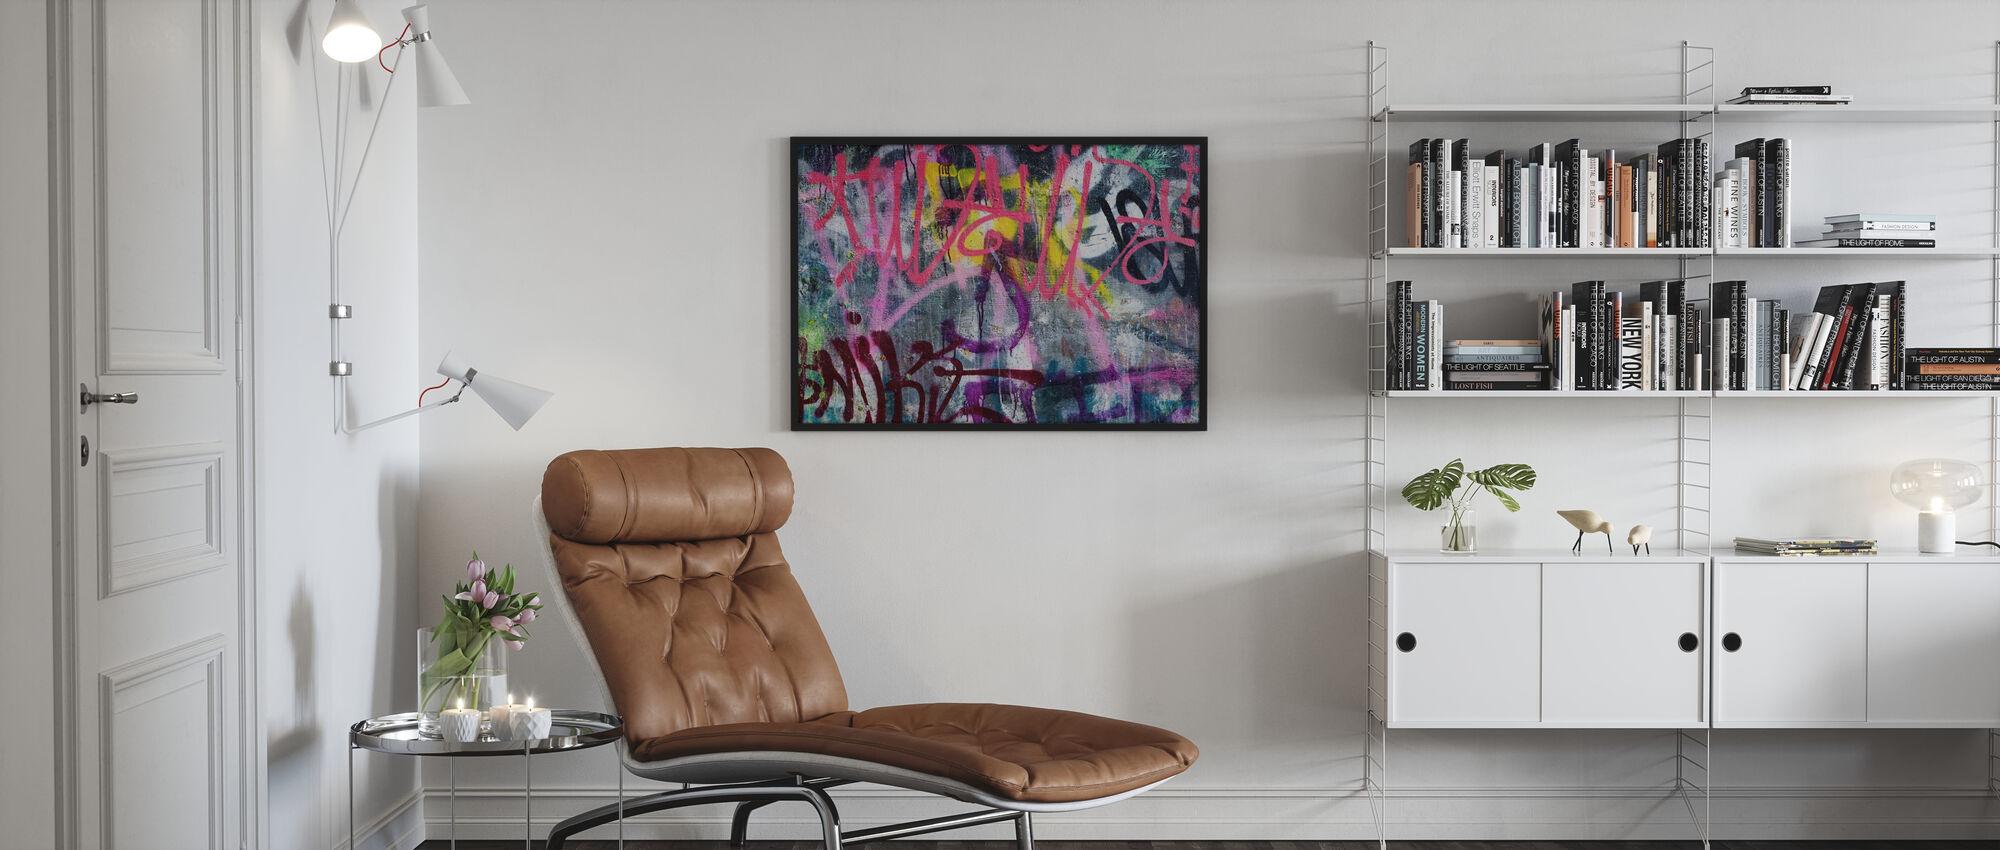 Colorful Graffiti - Poster - Living Room